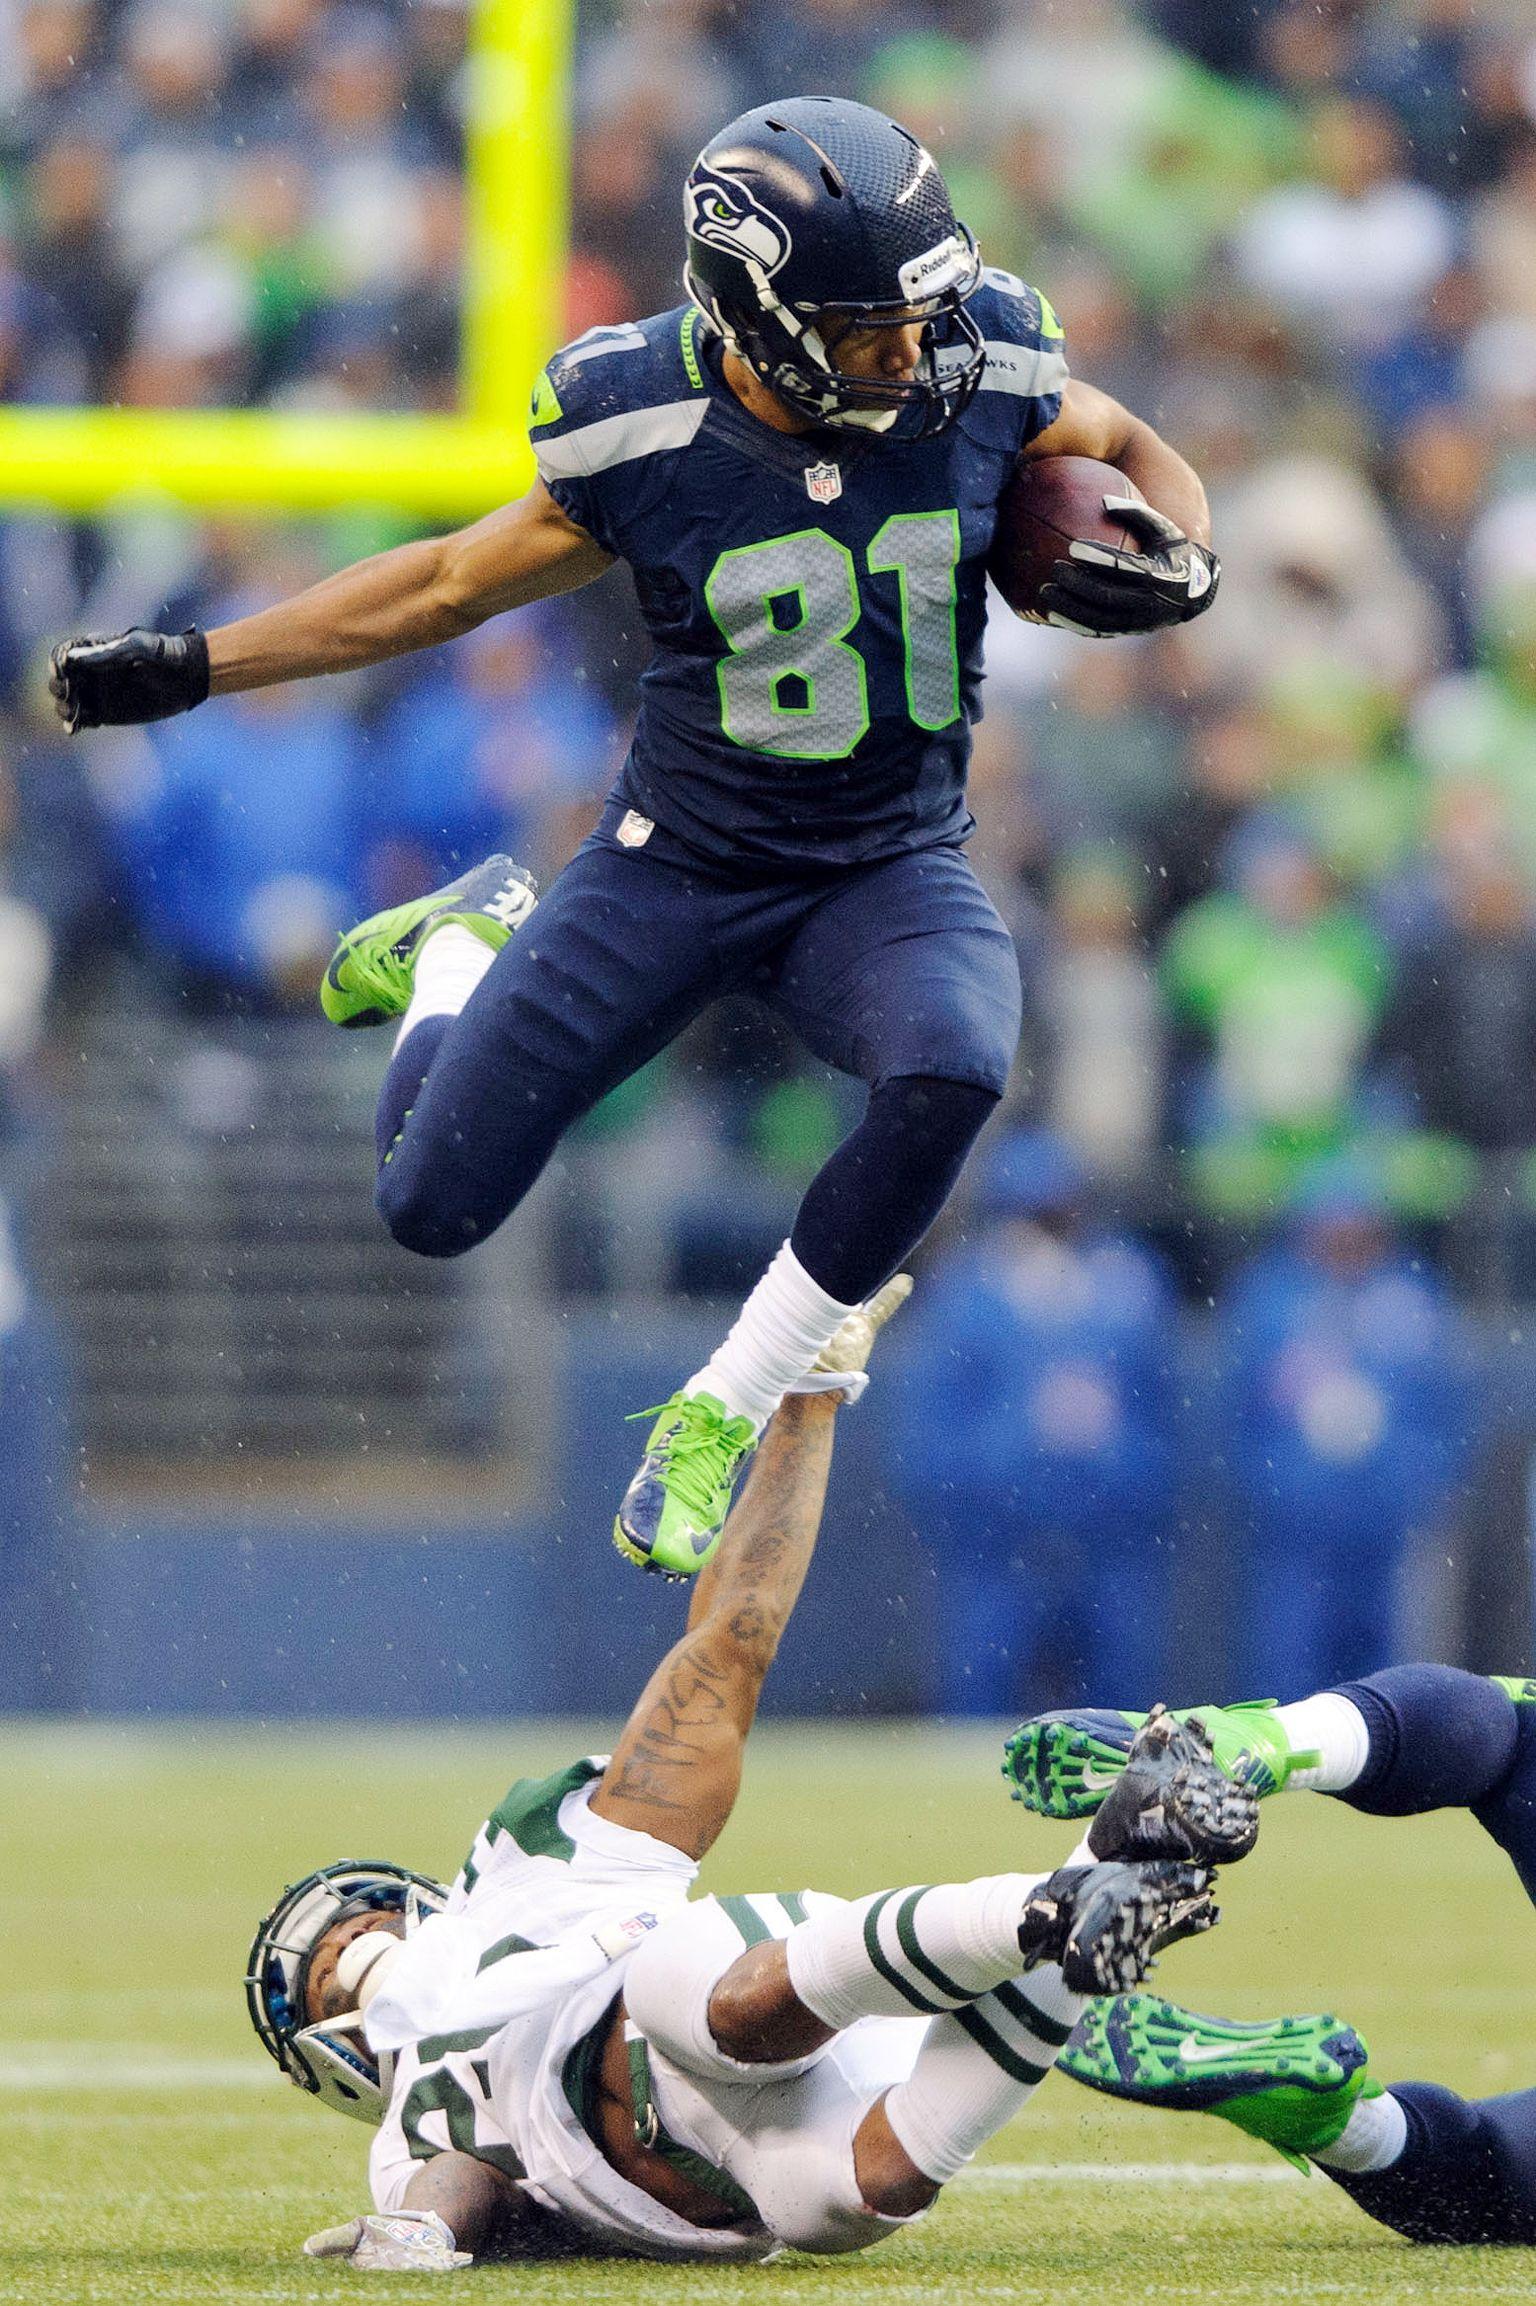 Photos of the Day November 12, 2012 Seahawks football